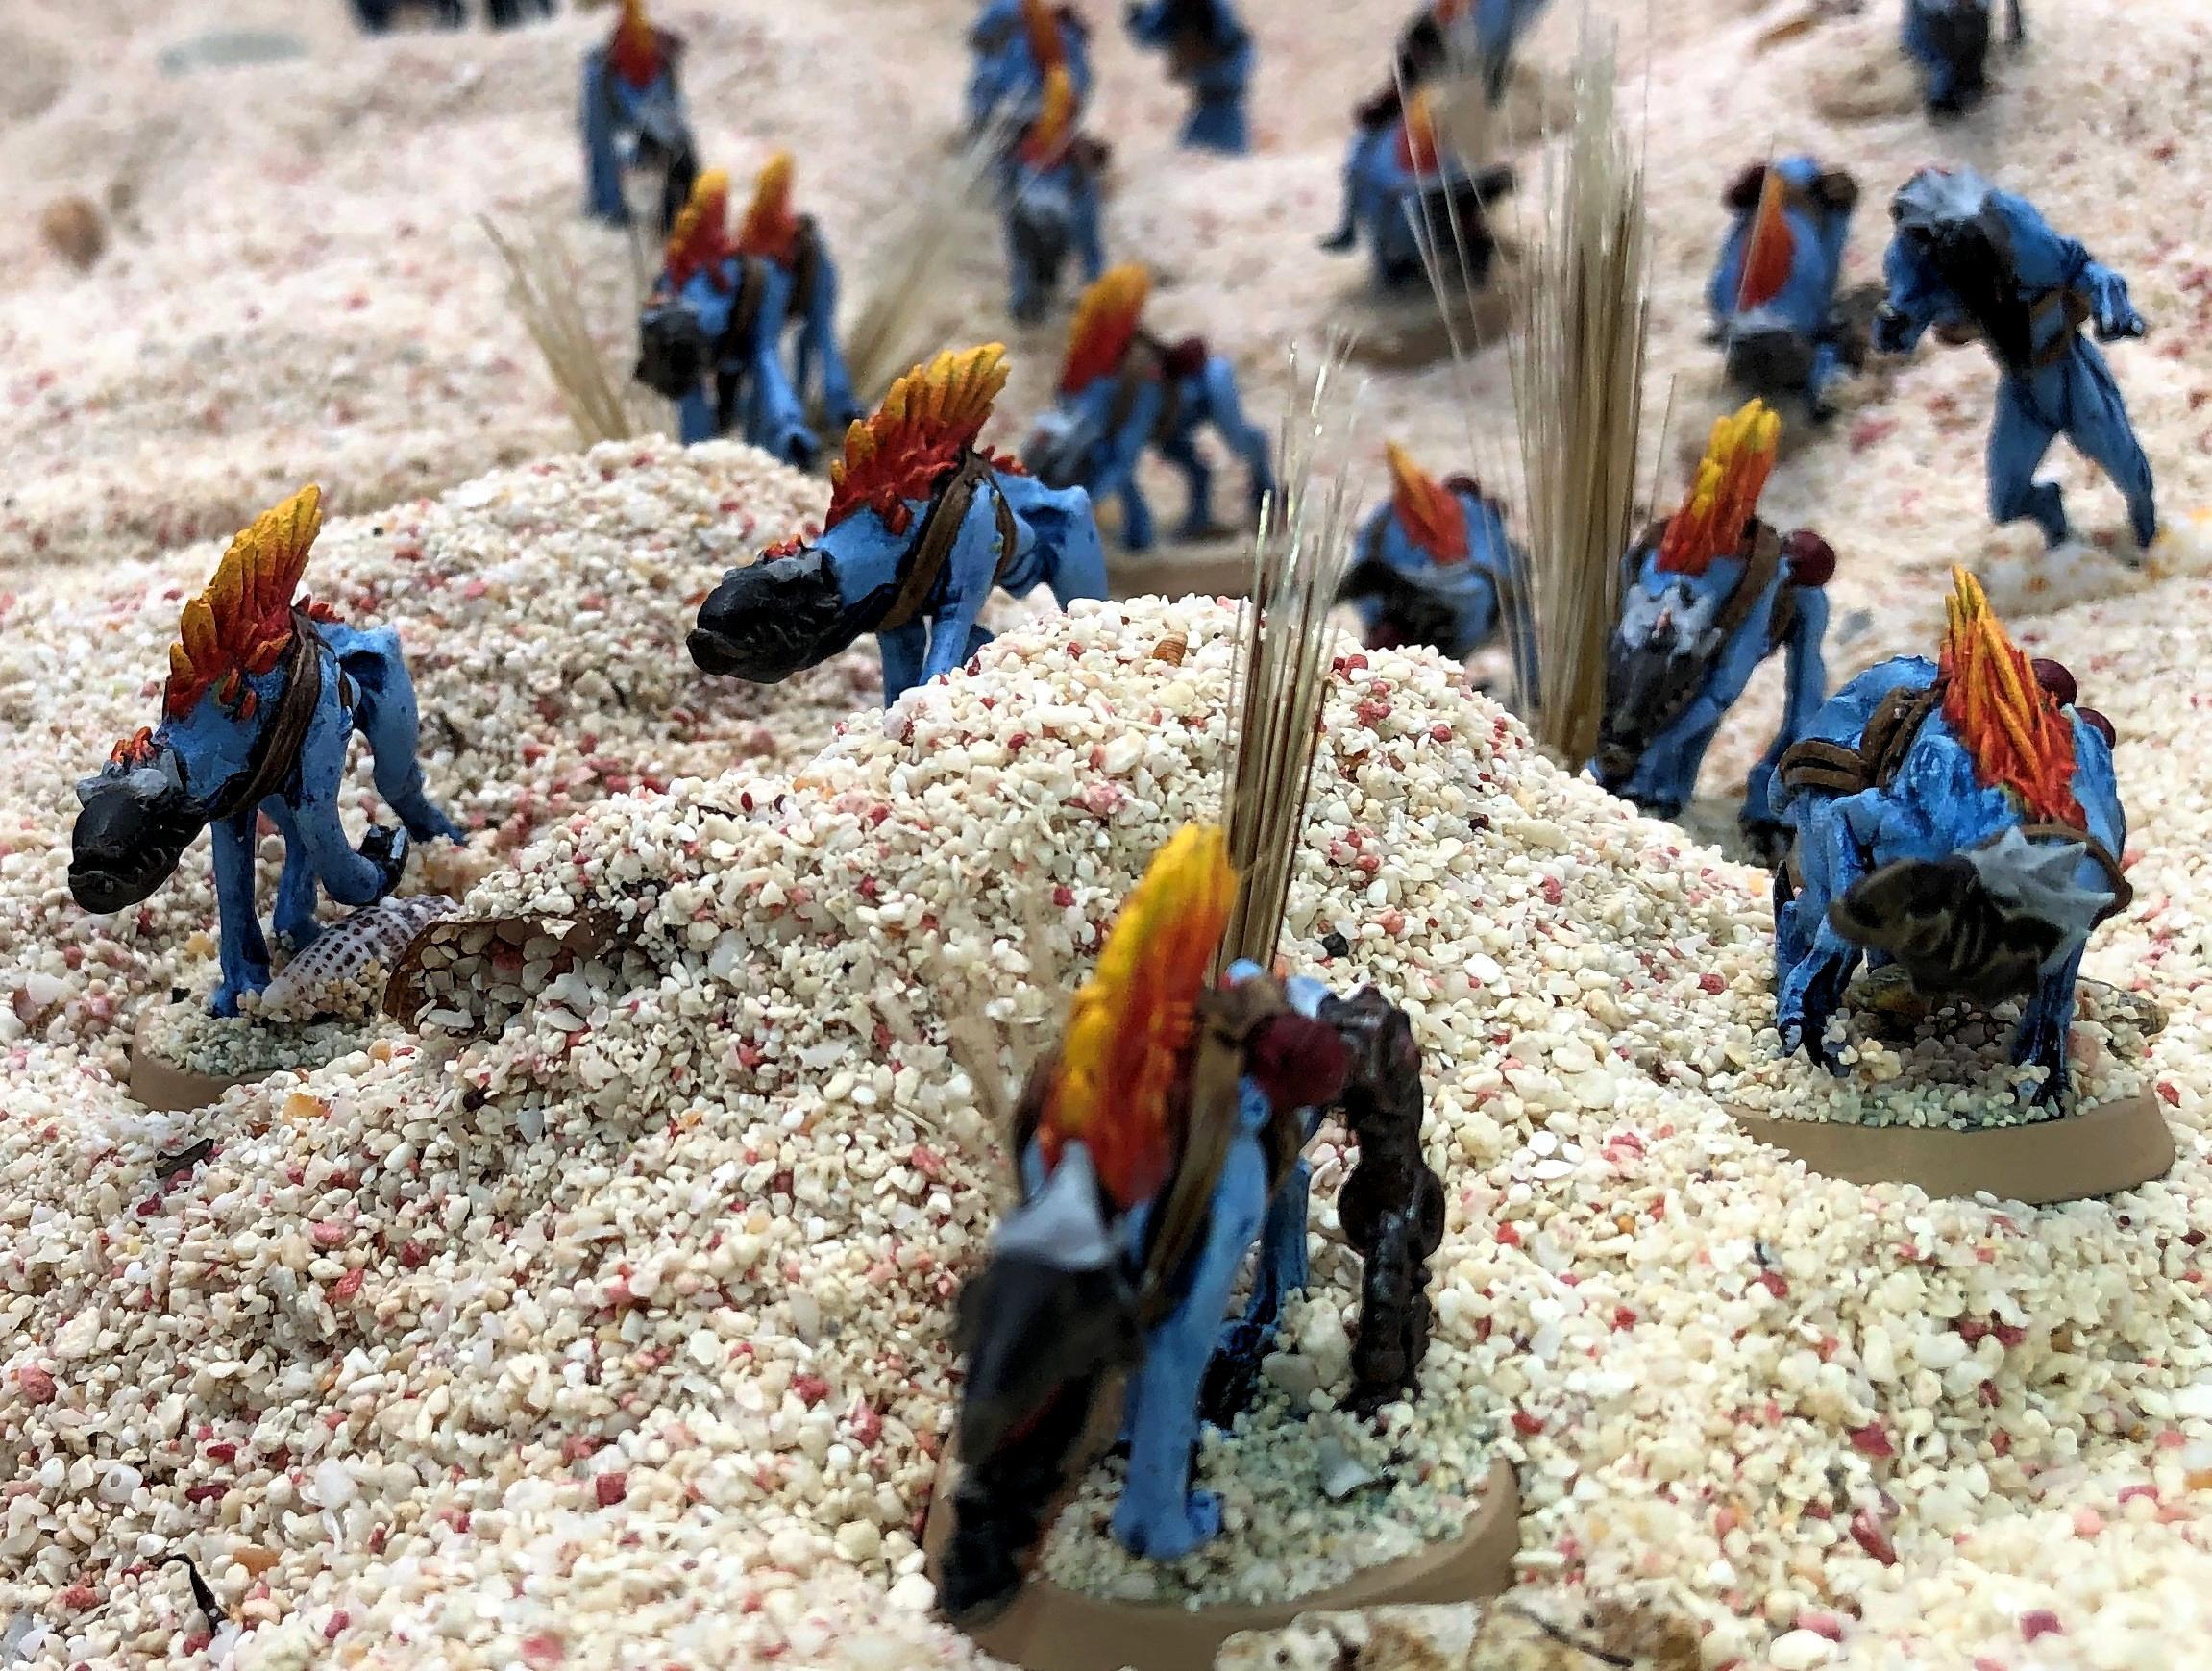 Battlefleet Gothic, Cavalry, Greater Knarloc, Knarloc, Kroot, Mercenary, Xenos